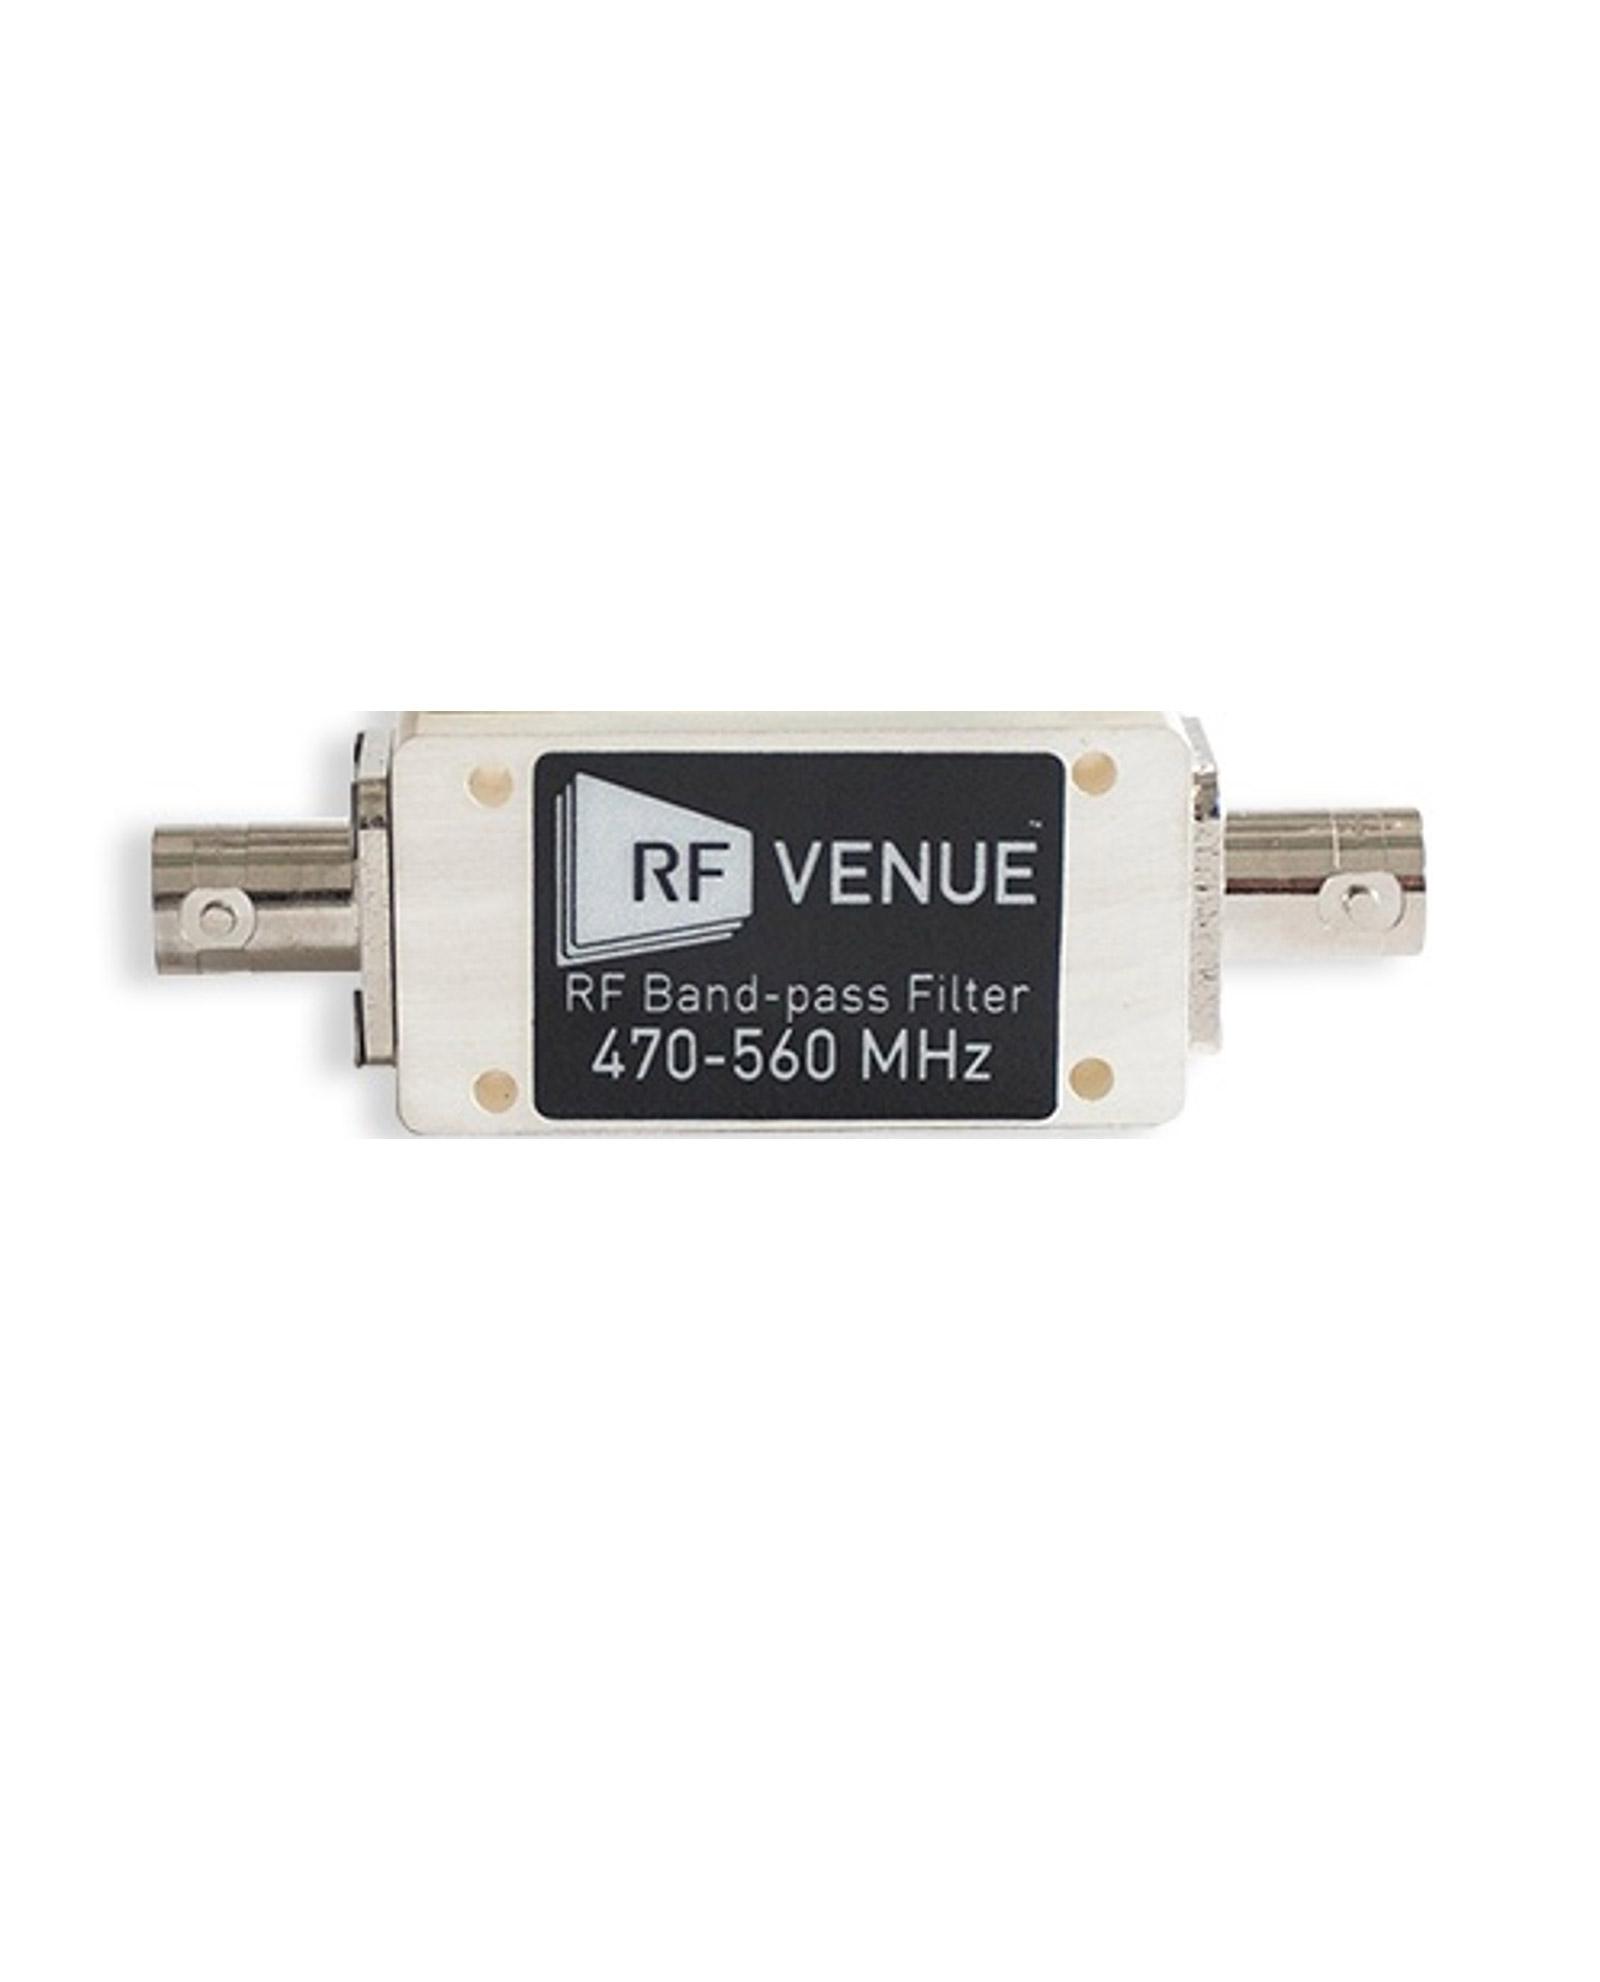 Rf Venue Rf Band Pass Filter